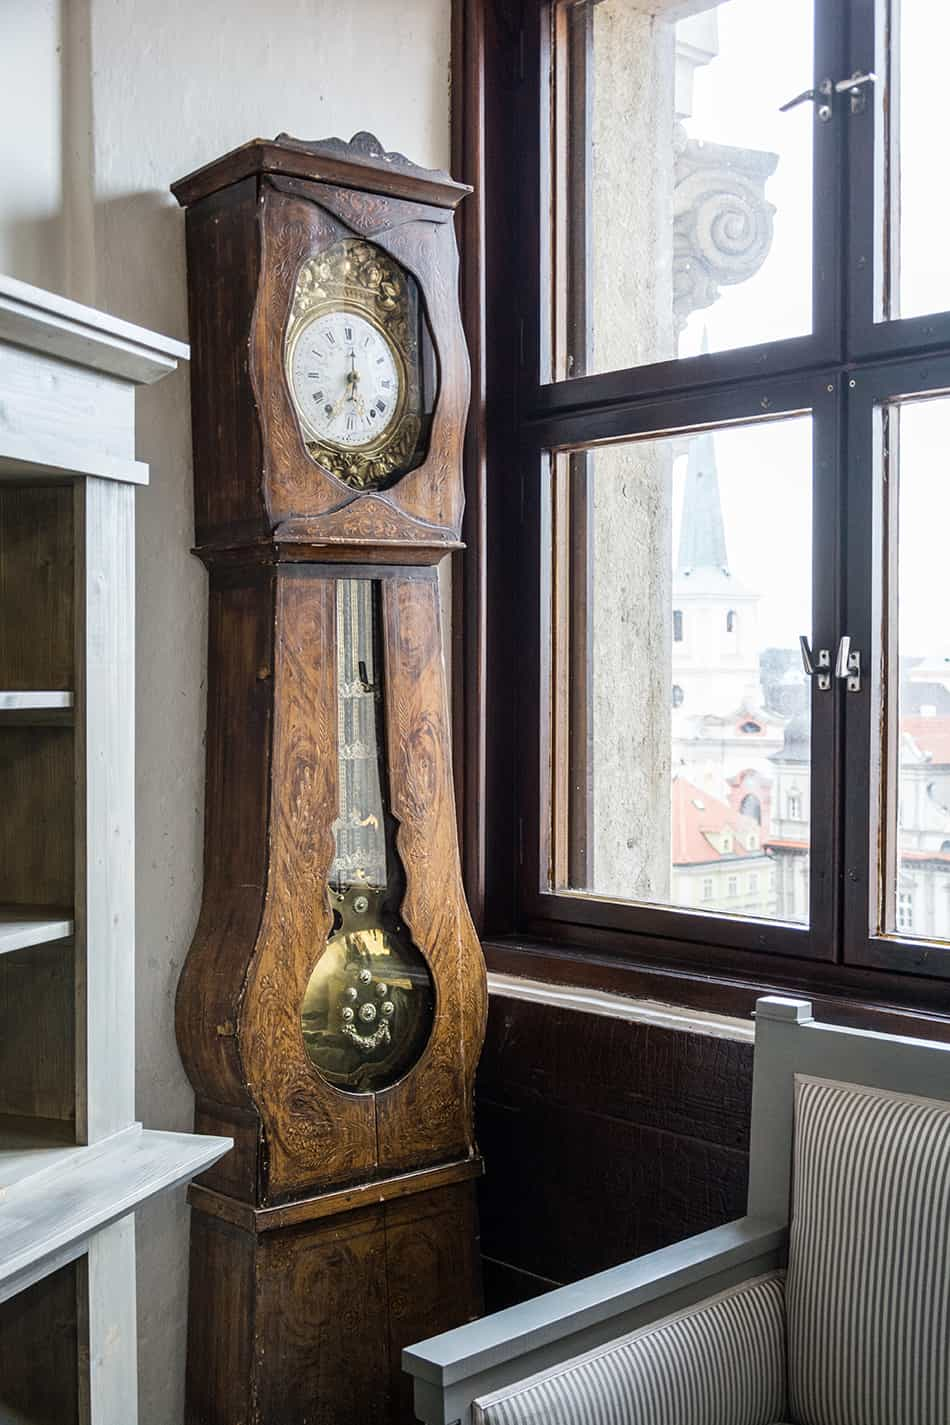 Age of Clock